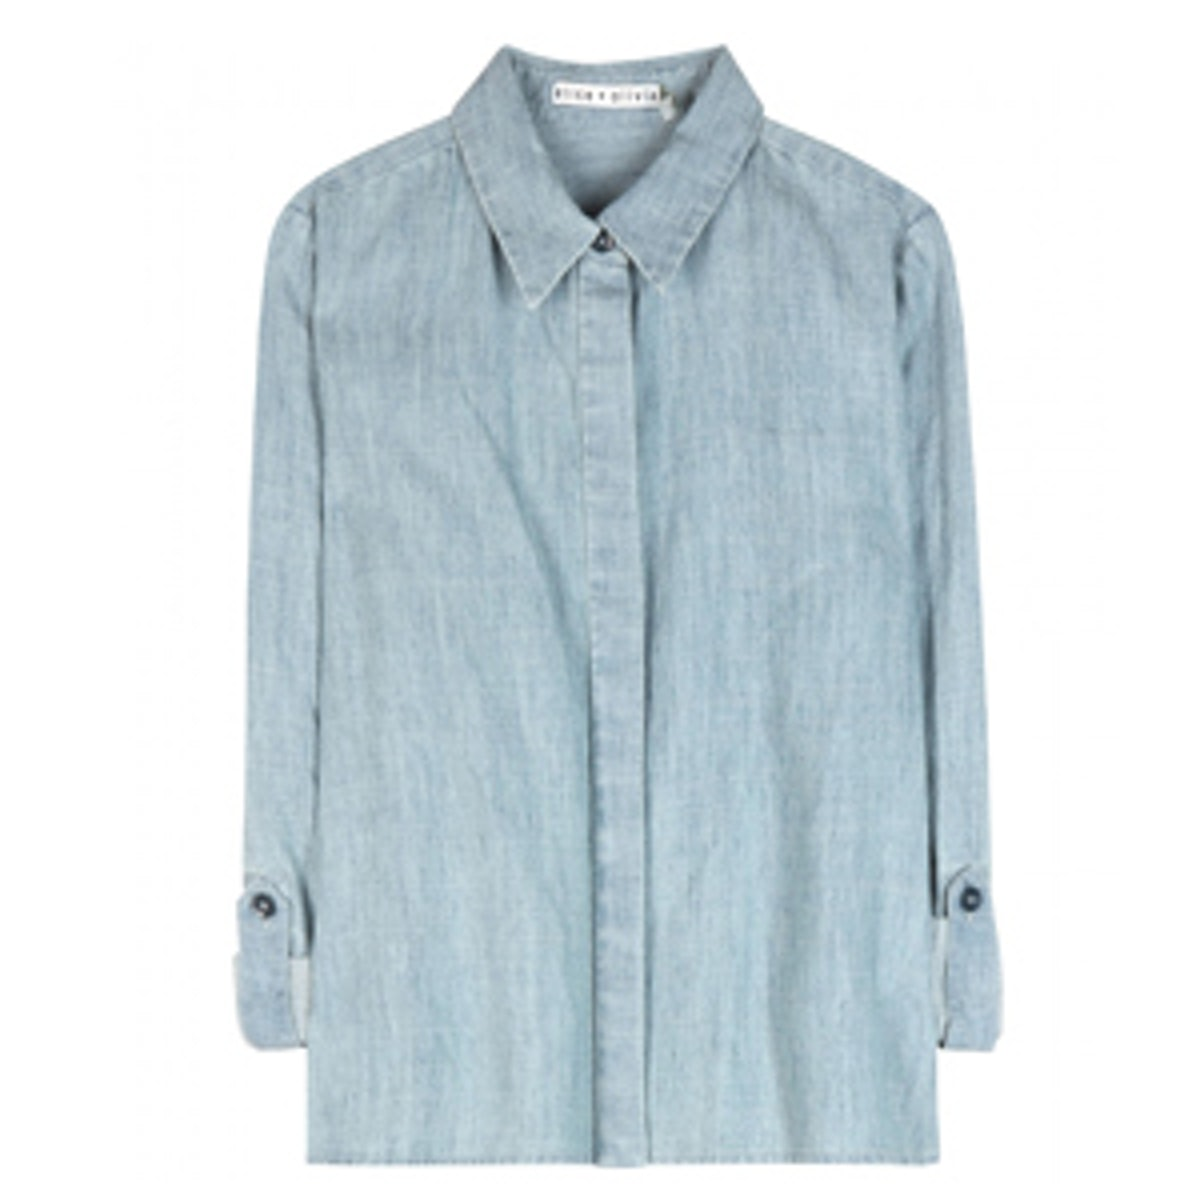 Greer Cropped Chambray Shirt